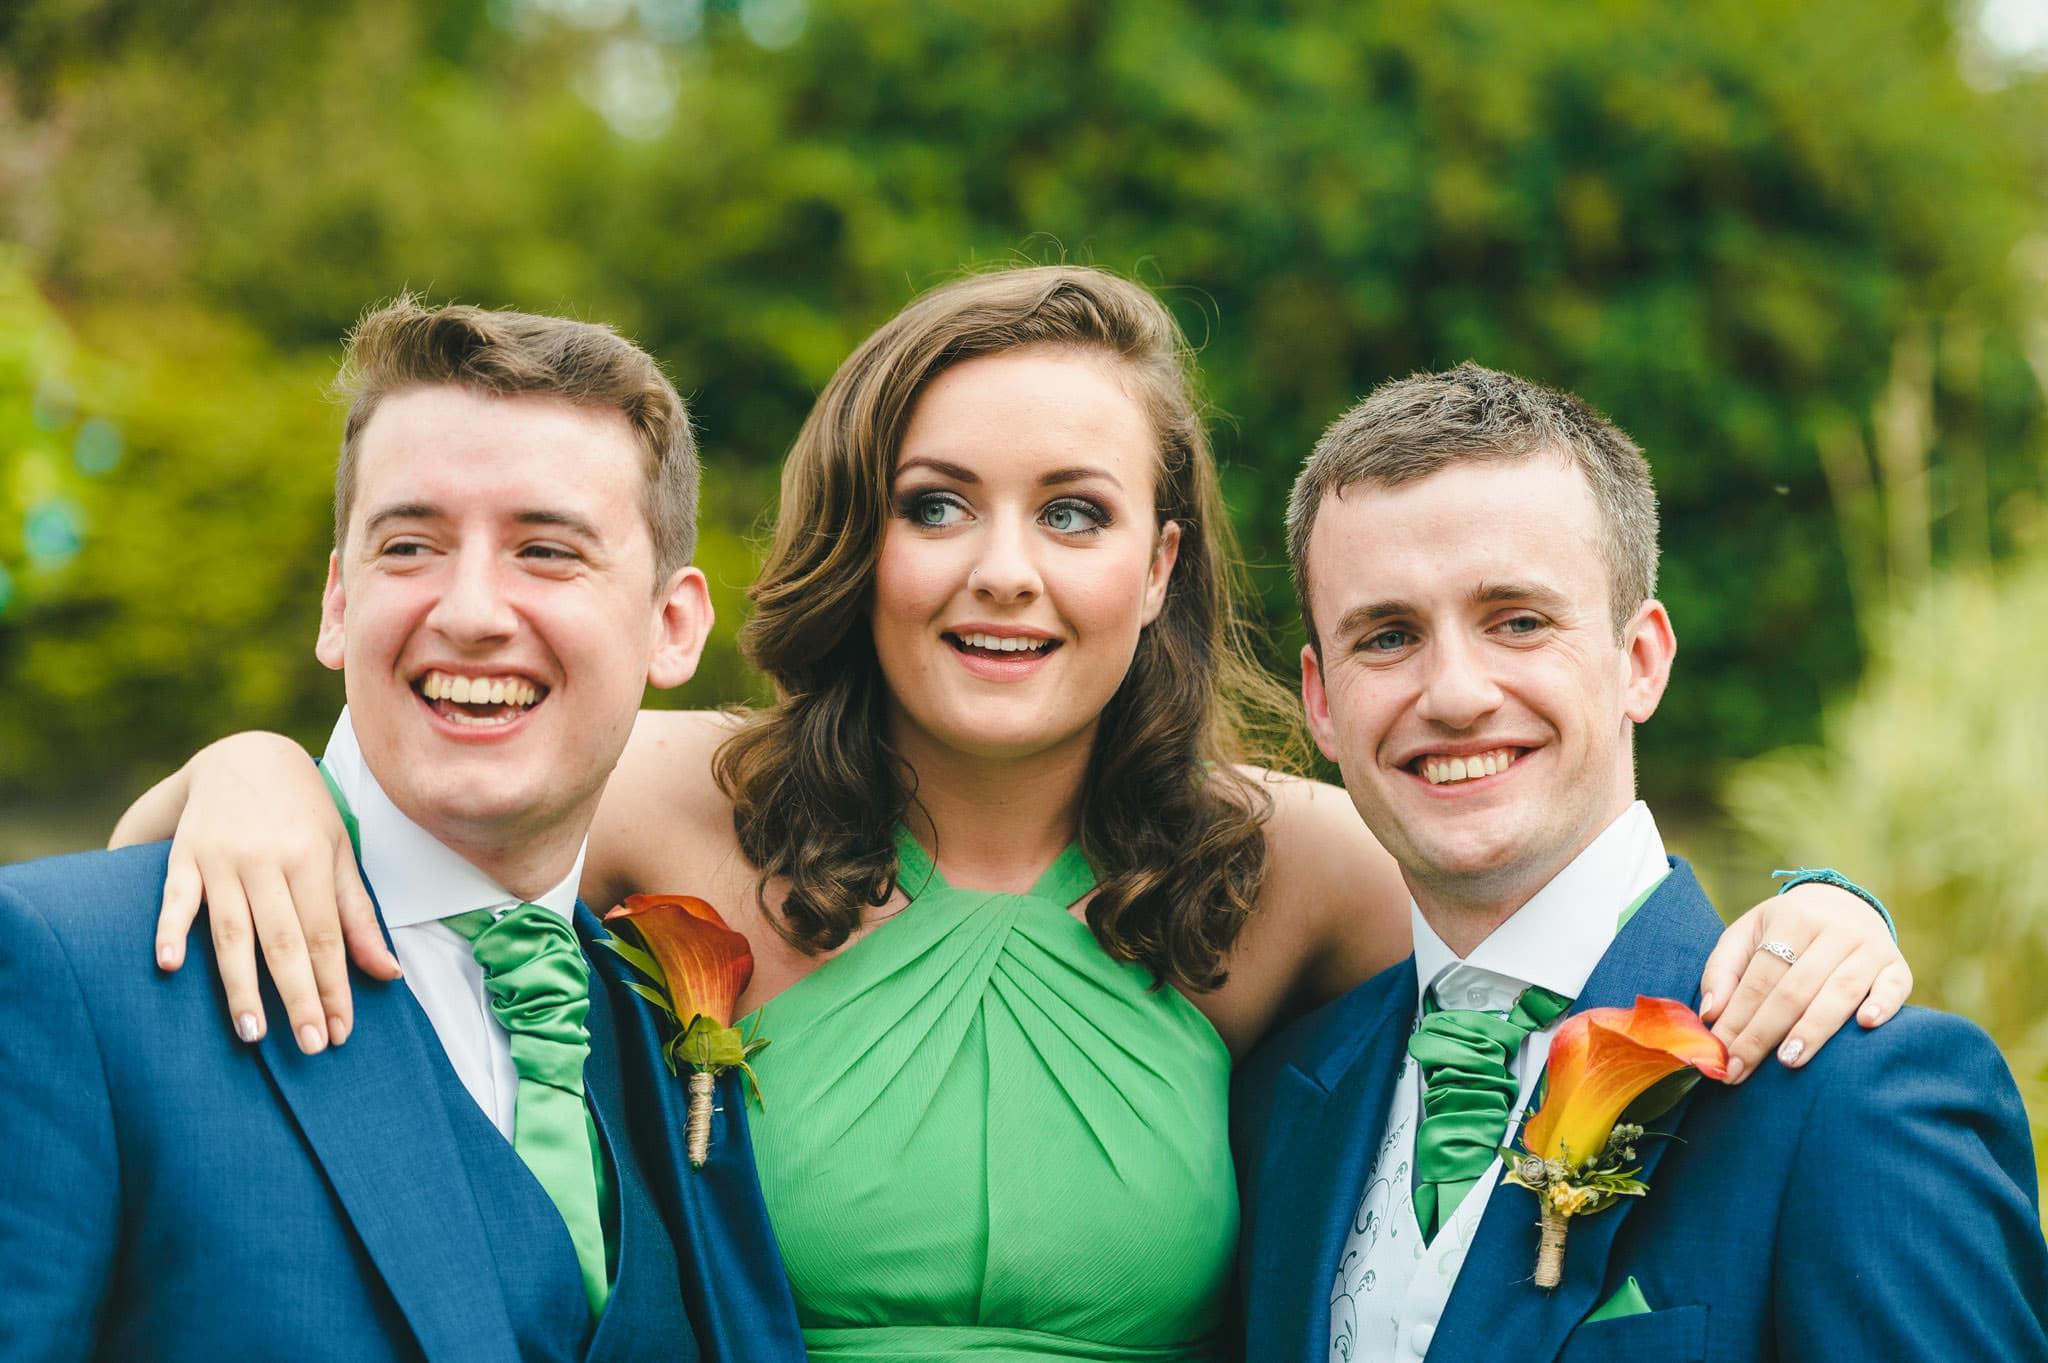 Wedding photography at Y Talbot Hotel in Tregaron, Wales   Tina + Phil 59